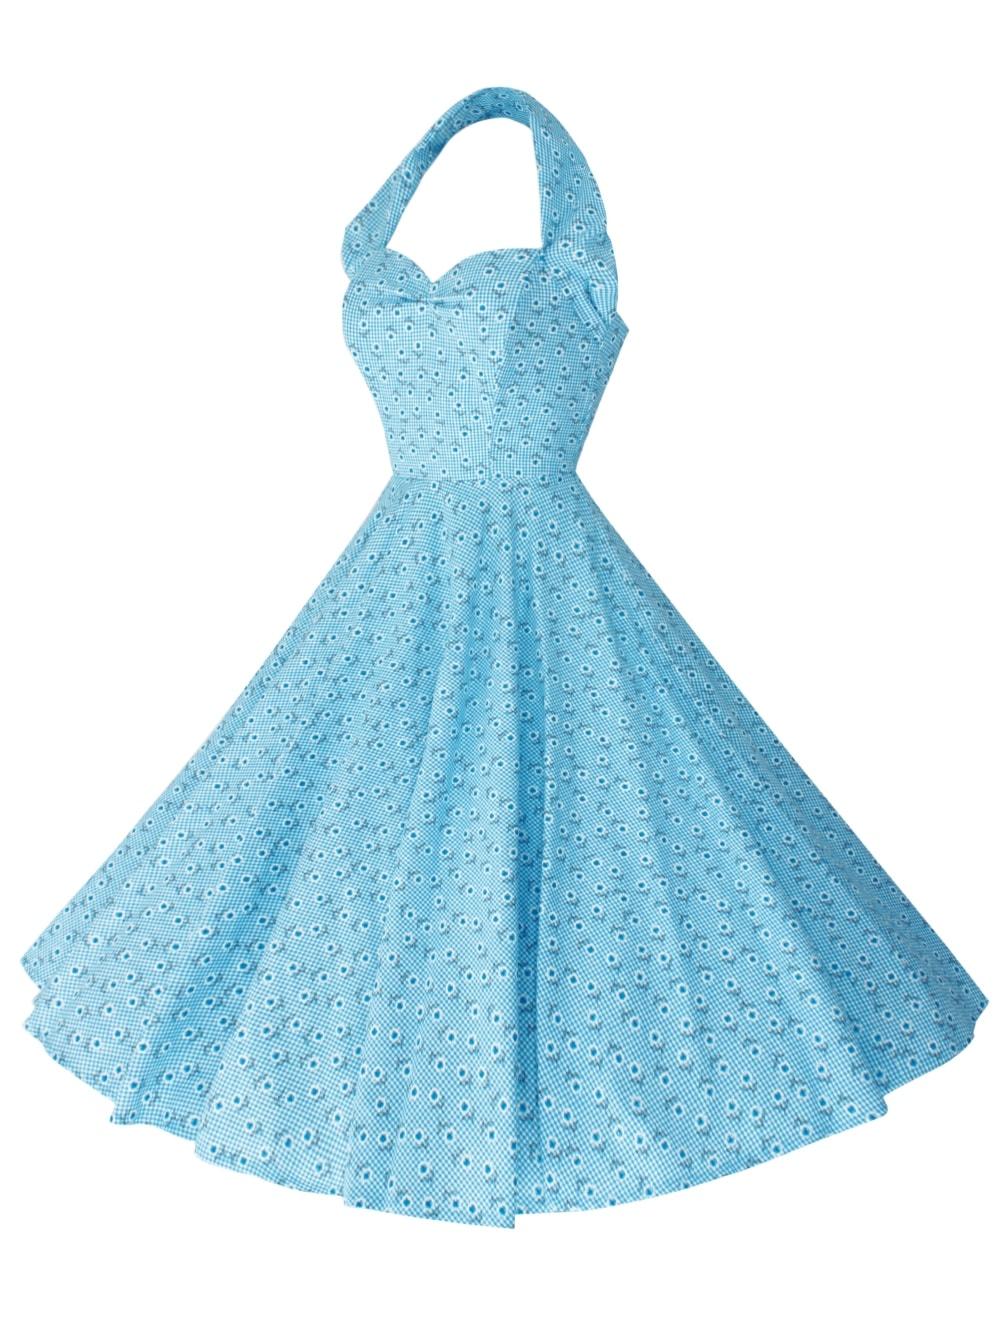 Exelent 1950s Party Dress Ornament - All Wedding Dresses ...